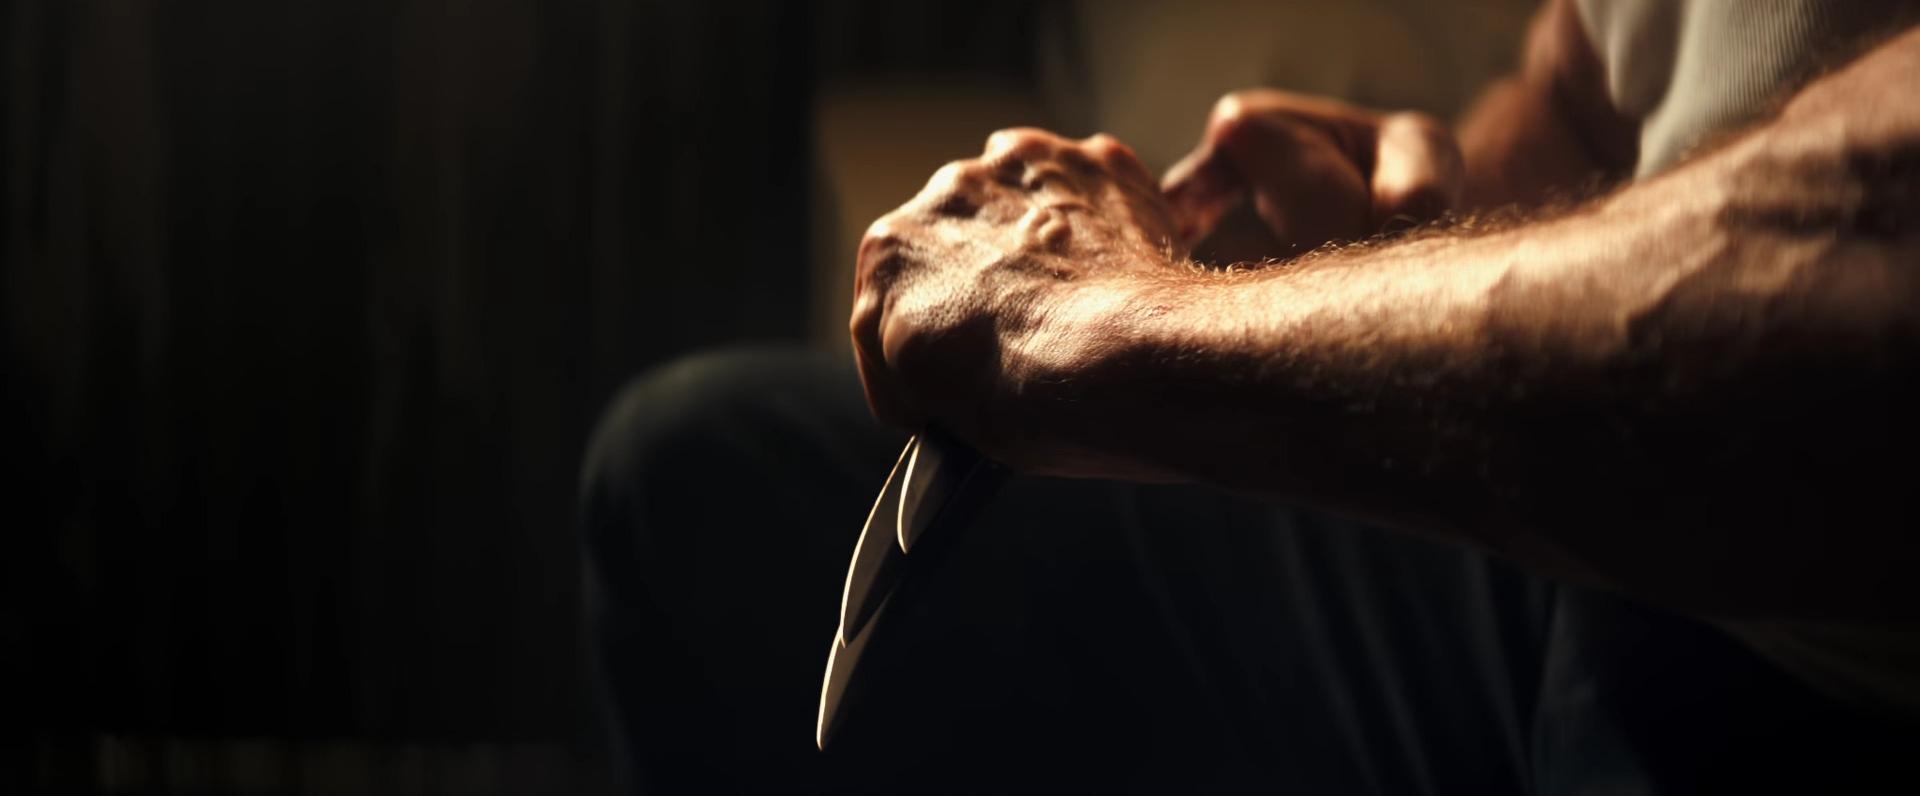 Logan Final Trailer